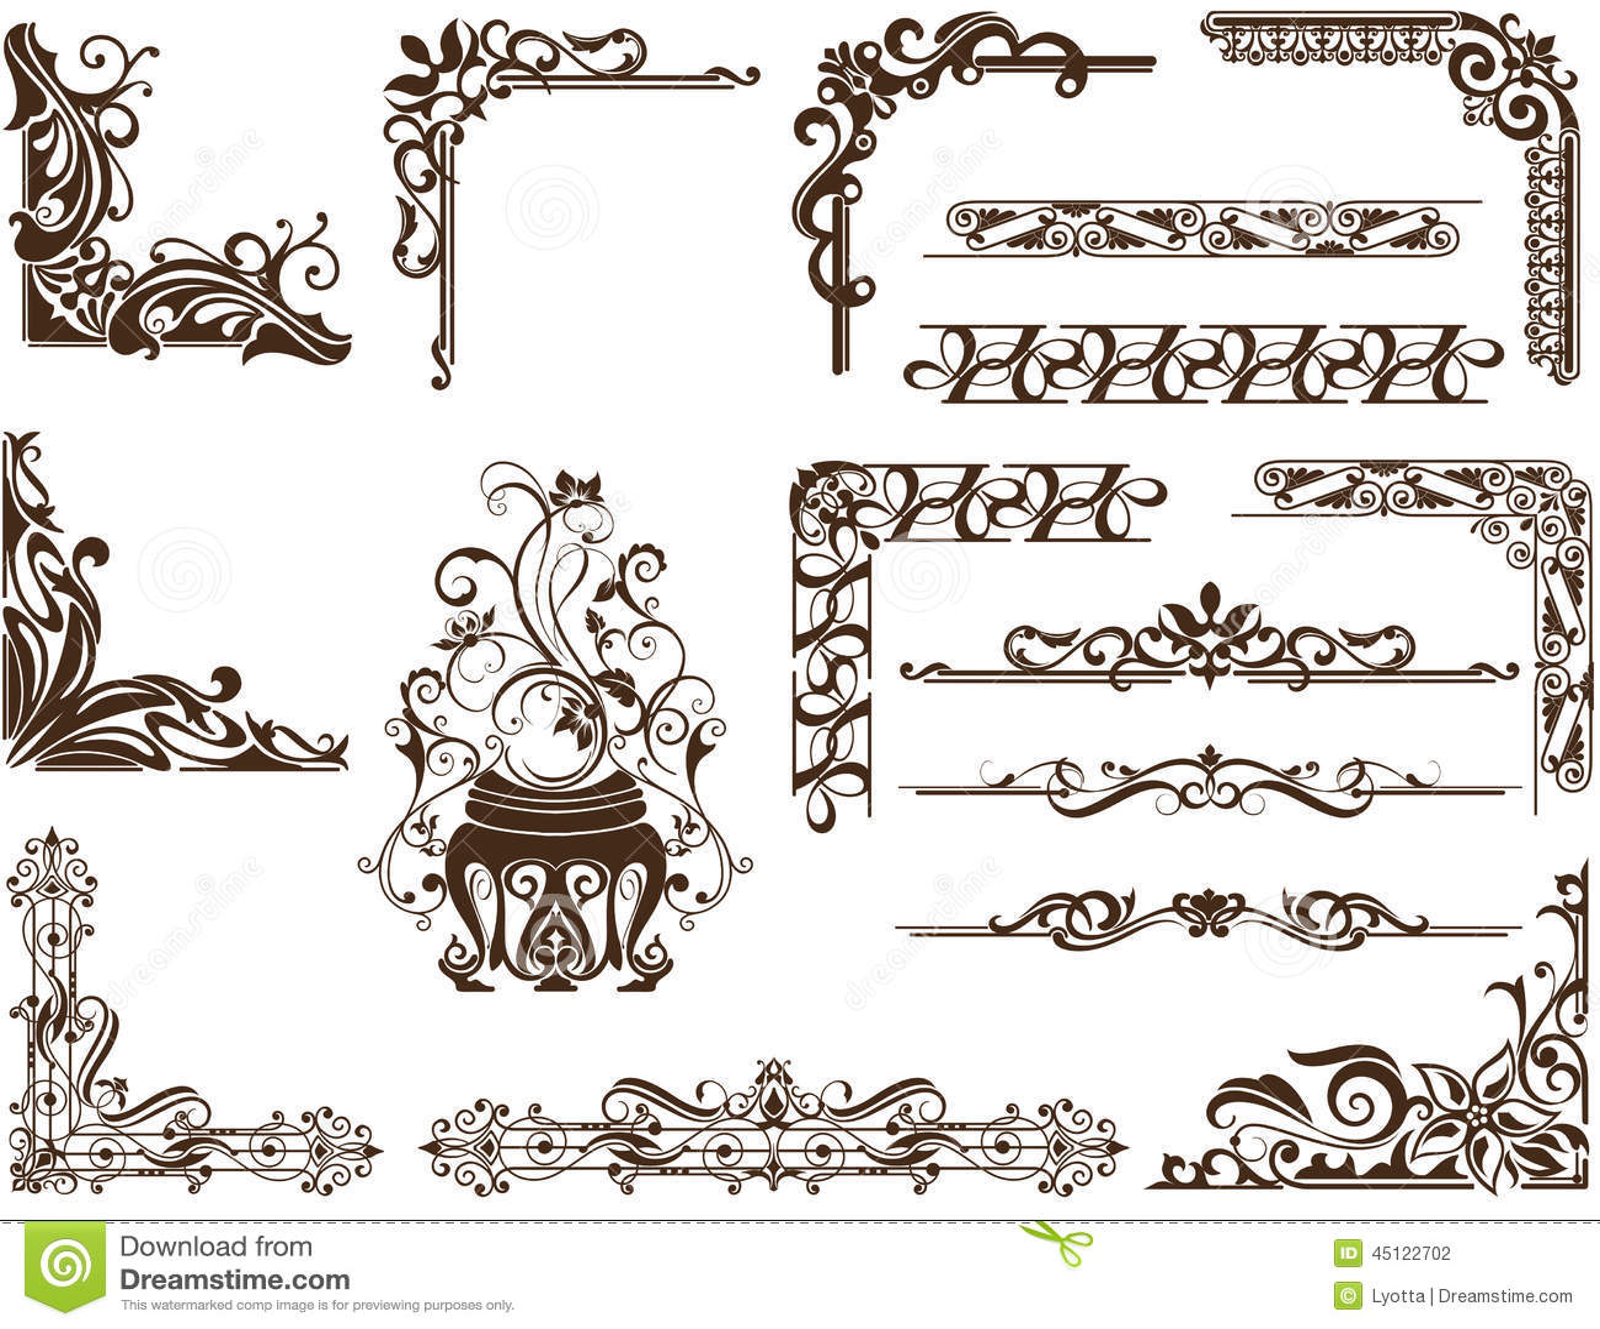 Graphic Design Certificate Europe